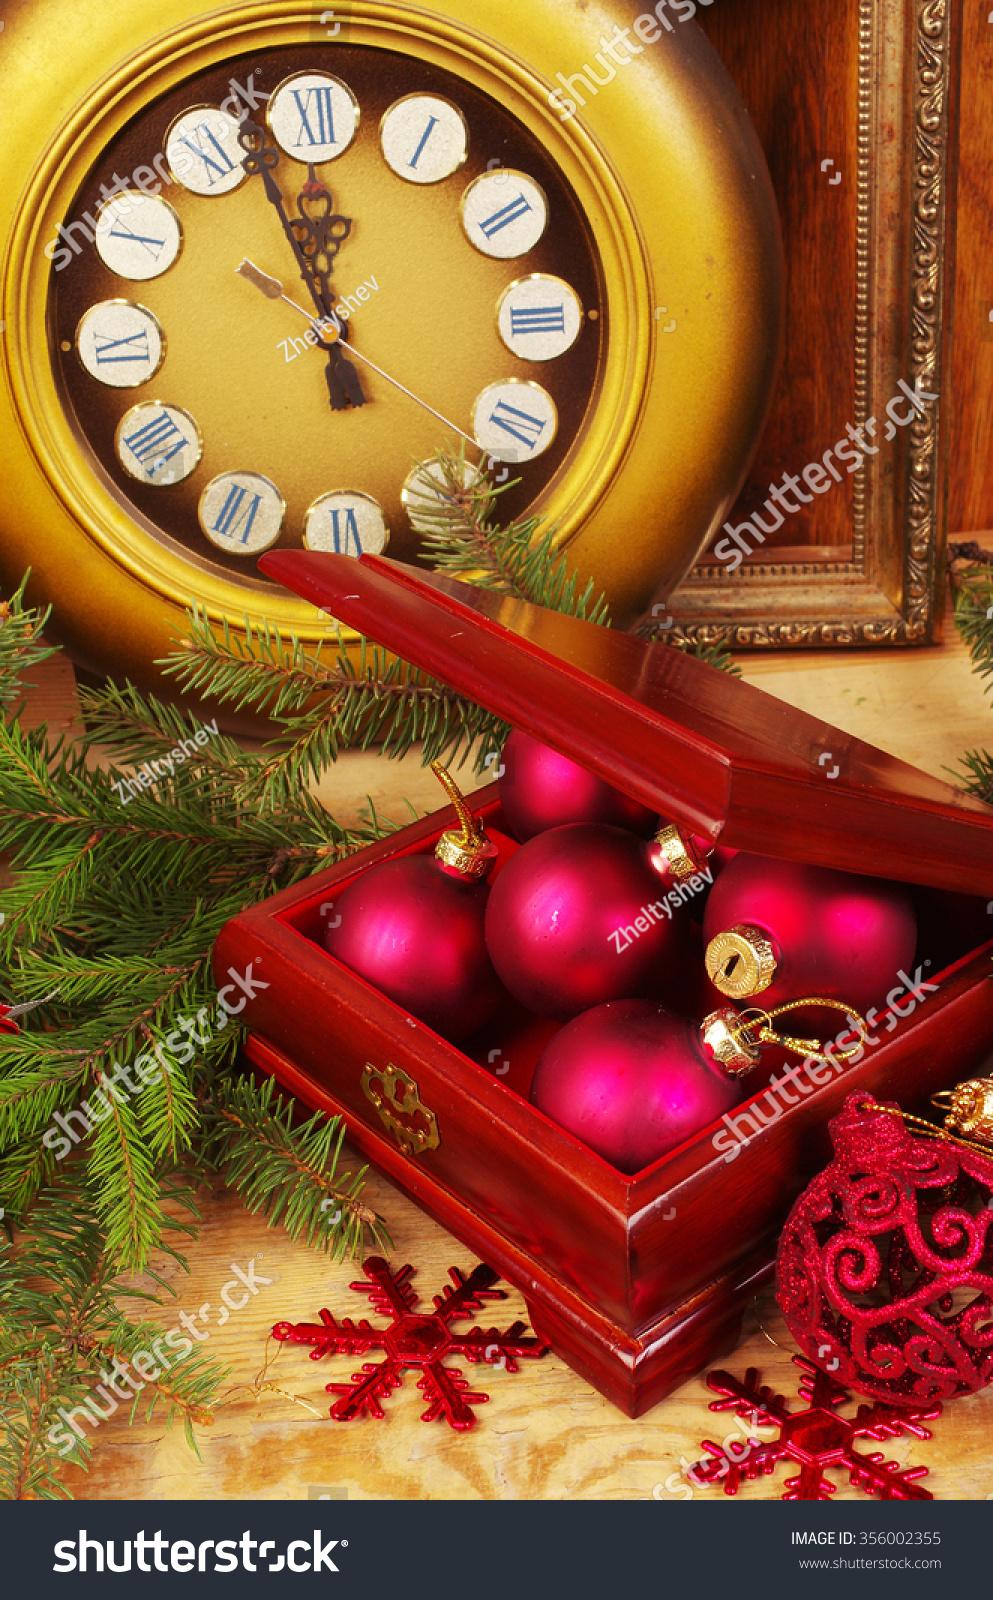 Old Clock Box Christmas Decorations Stock Photo (Royalty Free ...